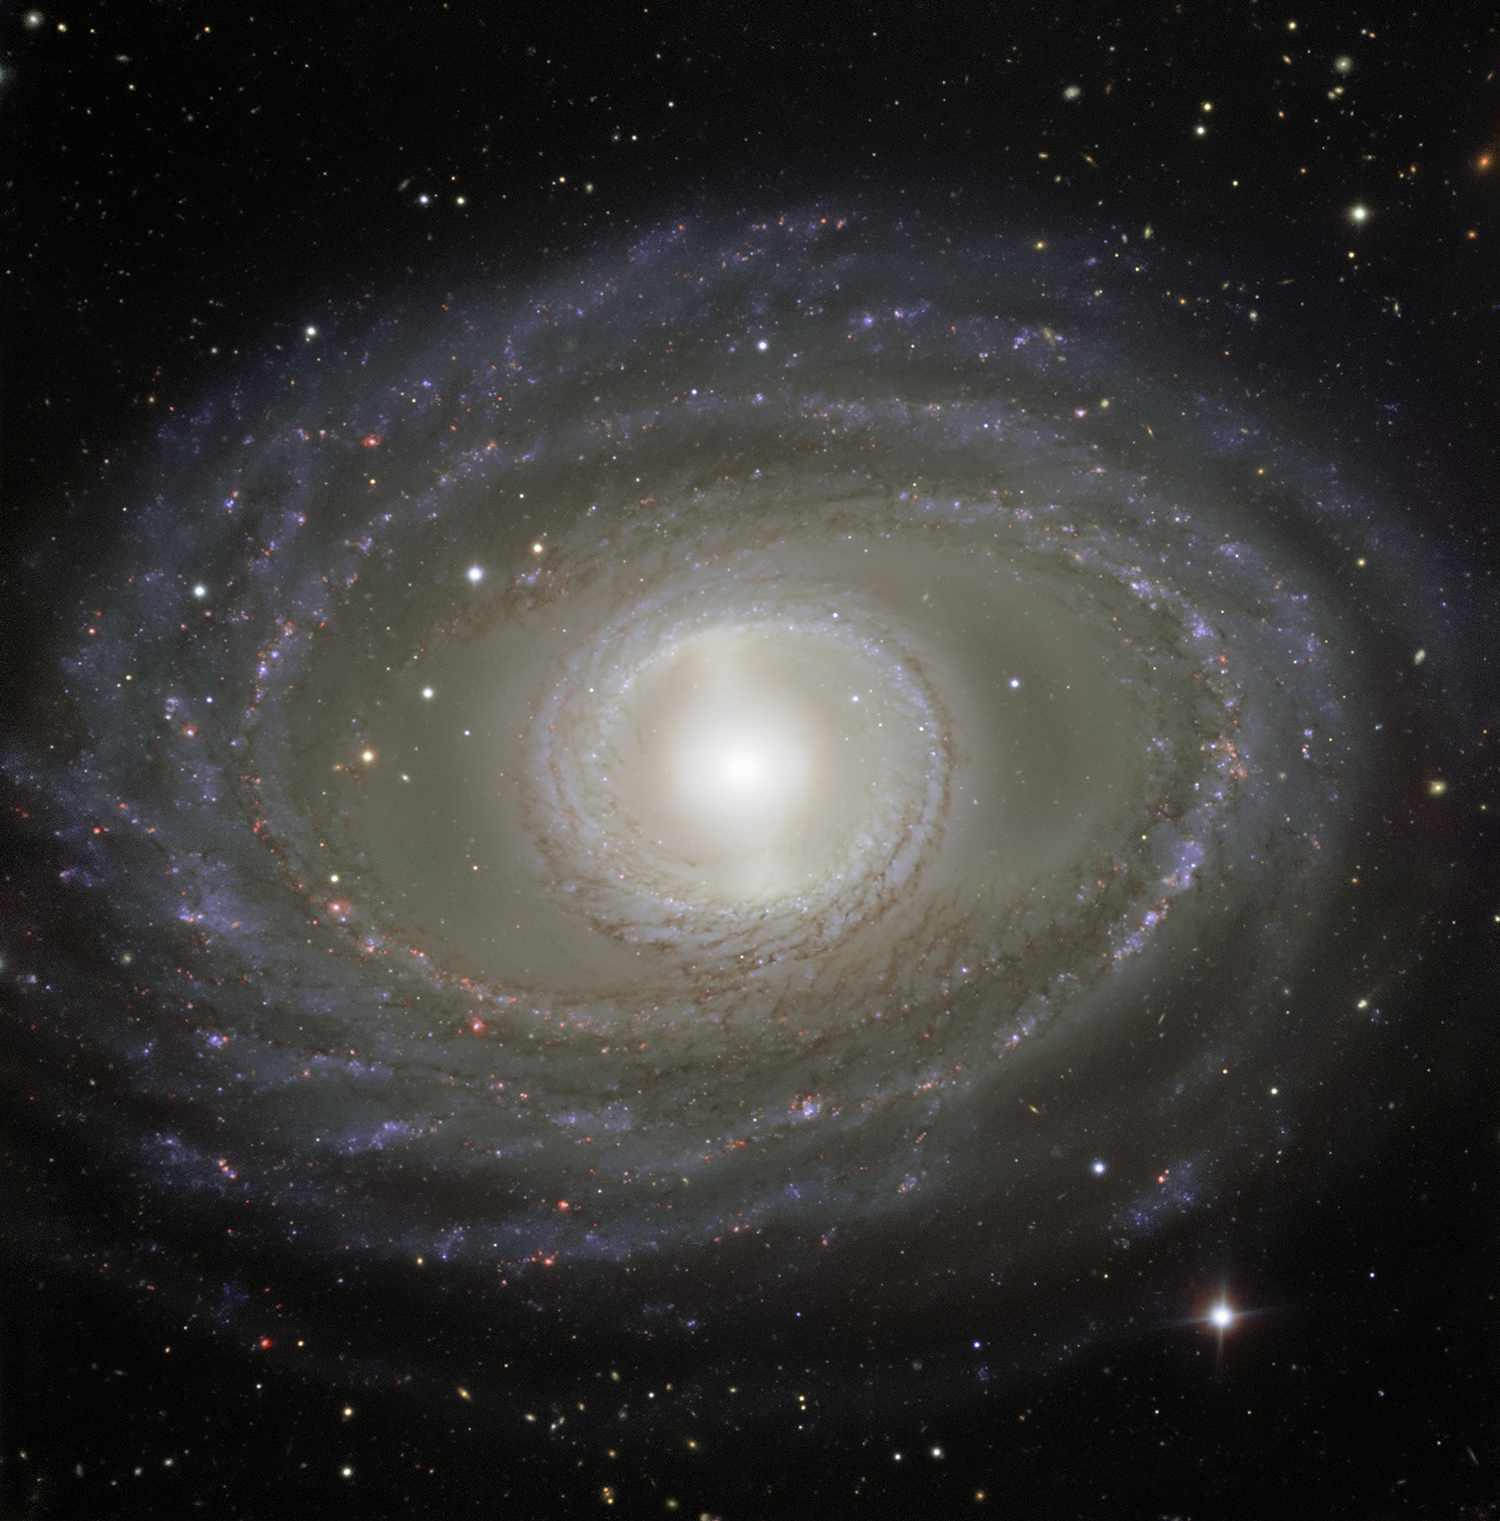 Galaxy NGC 1398, Very Large Telescope, 1 January 2018. Credit: ESO